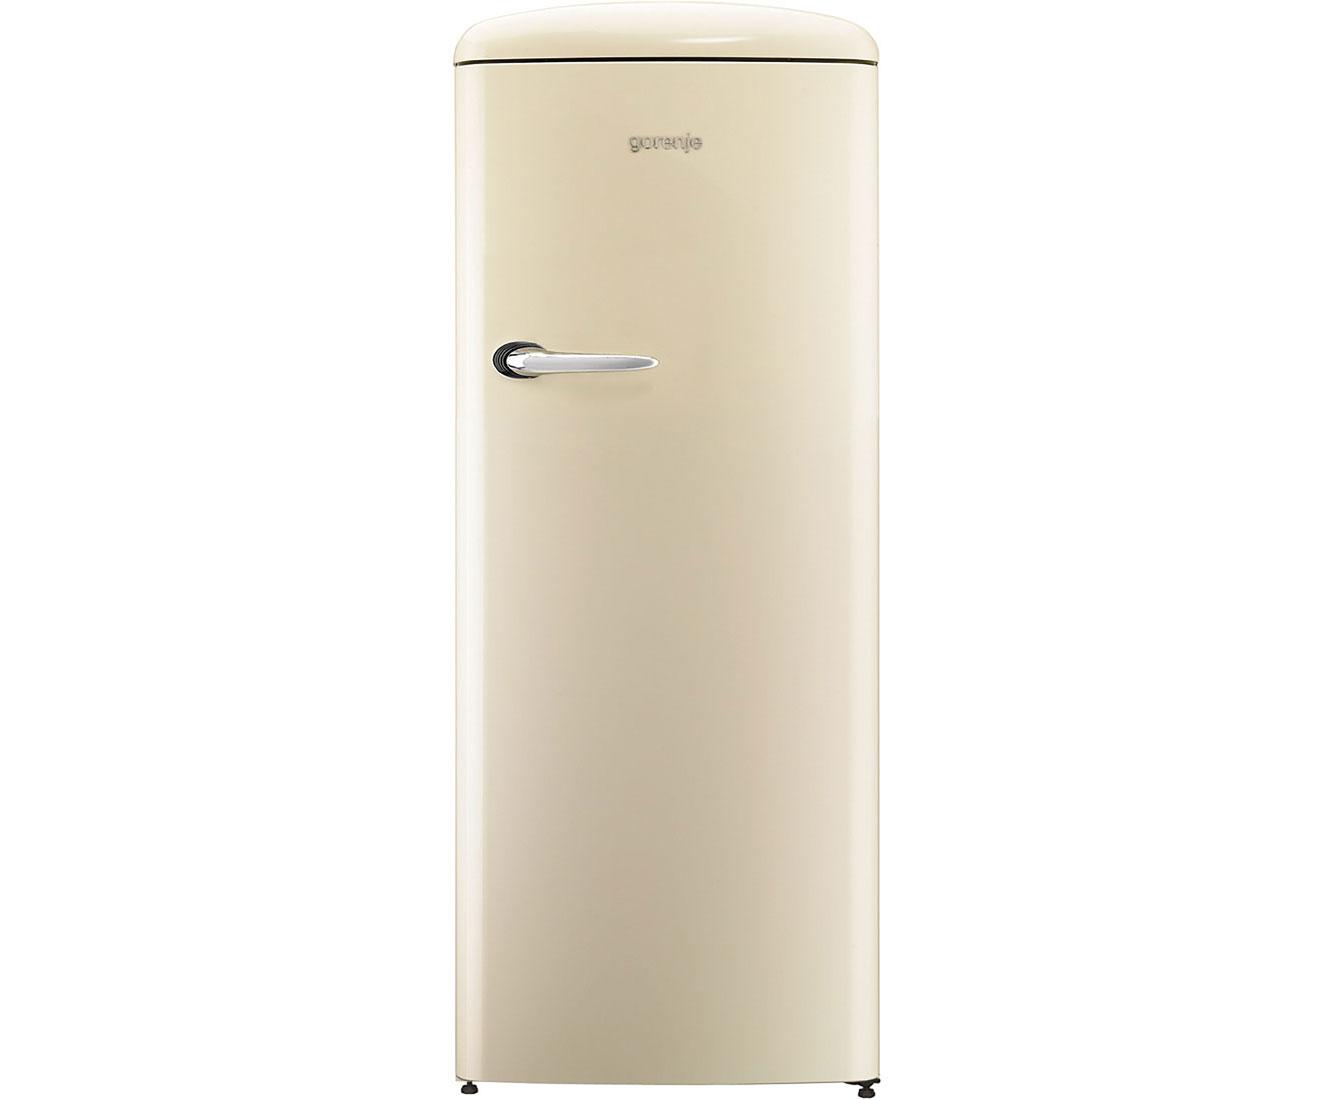 Gorenje Kühlschrank Vw Preis : Swarovski kühlschrank gorenje hodges shanon